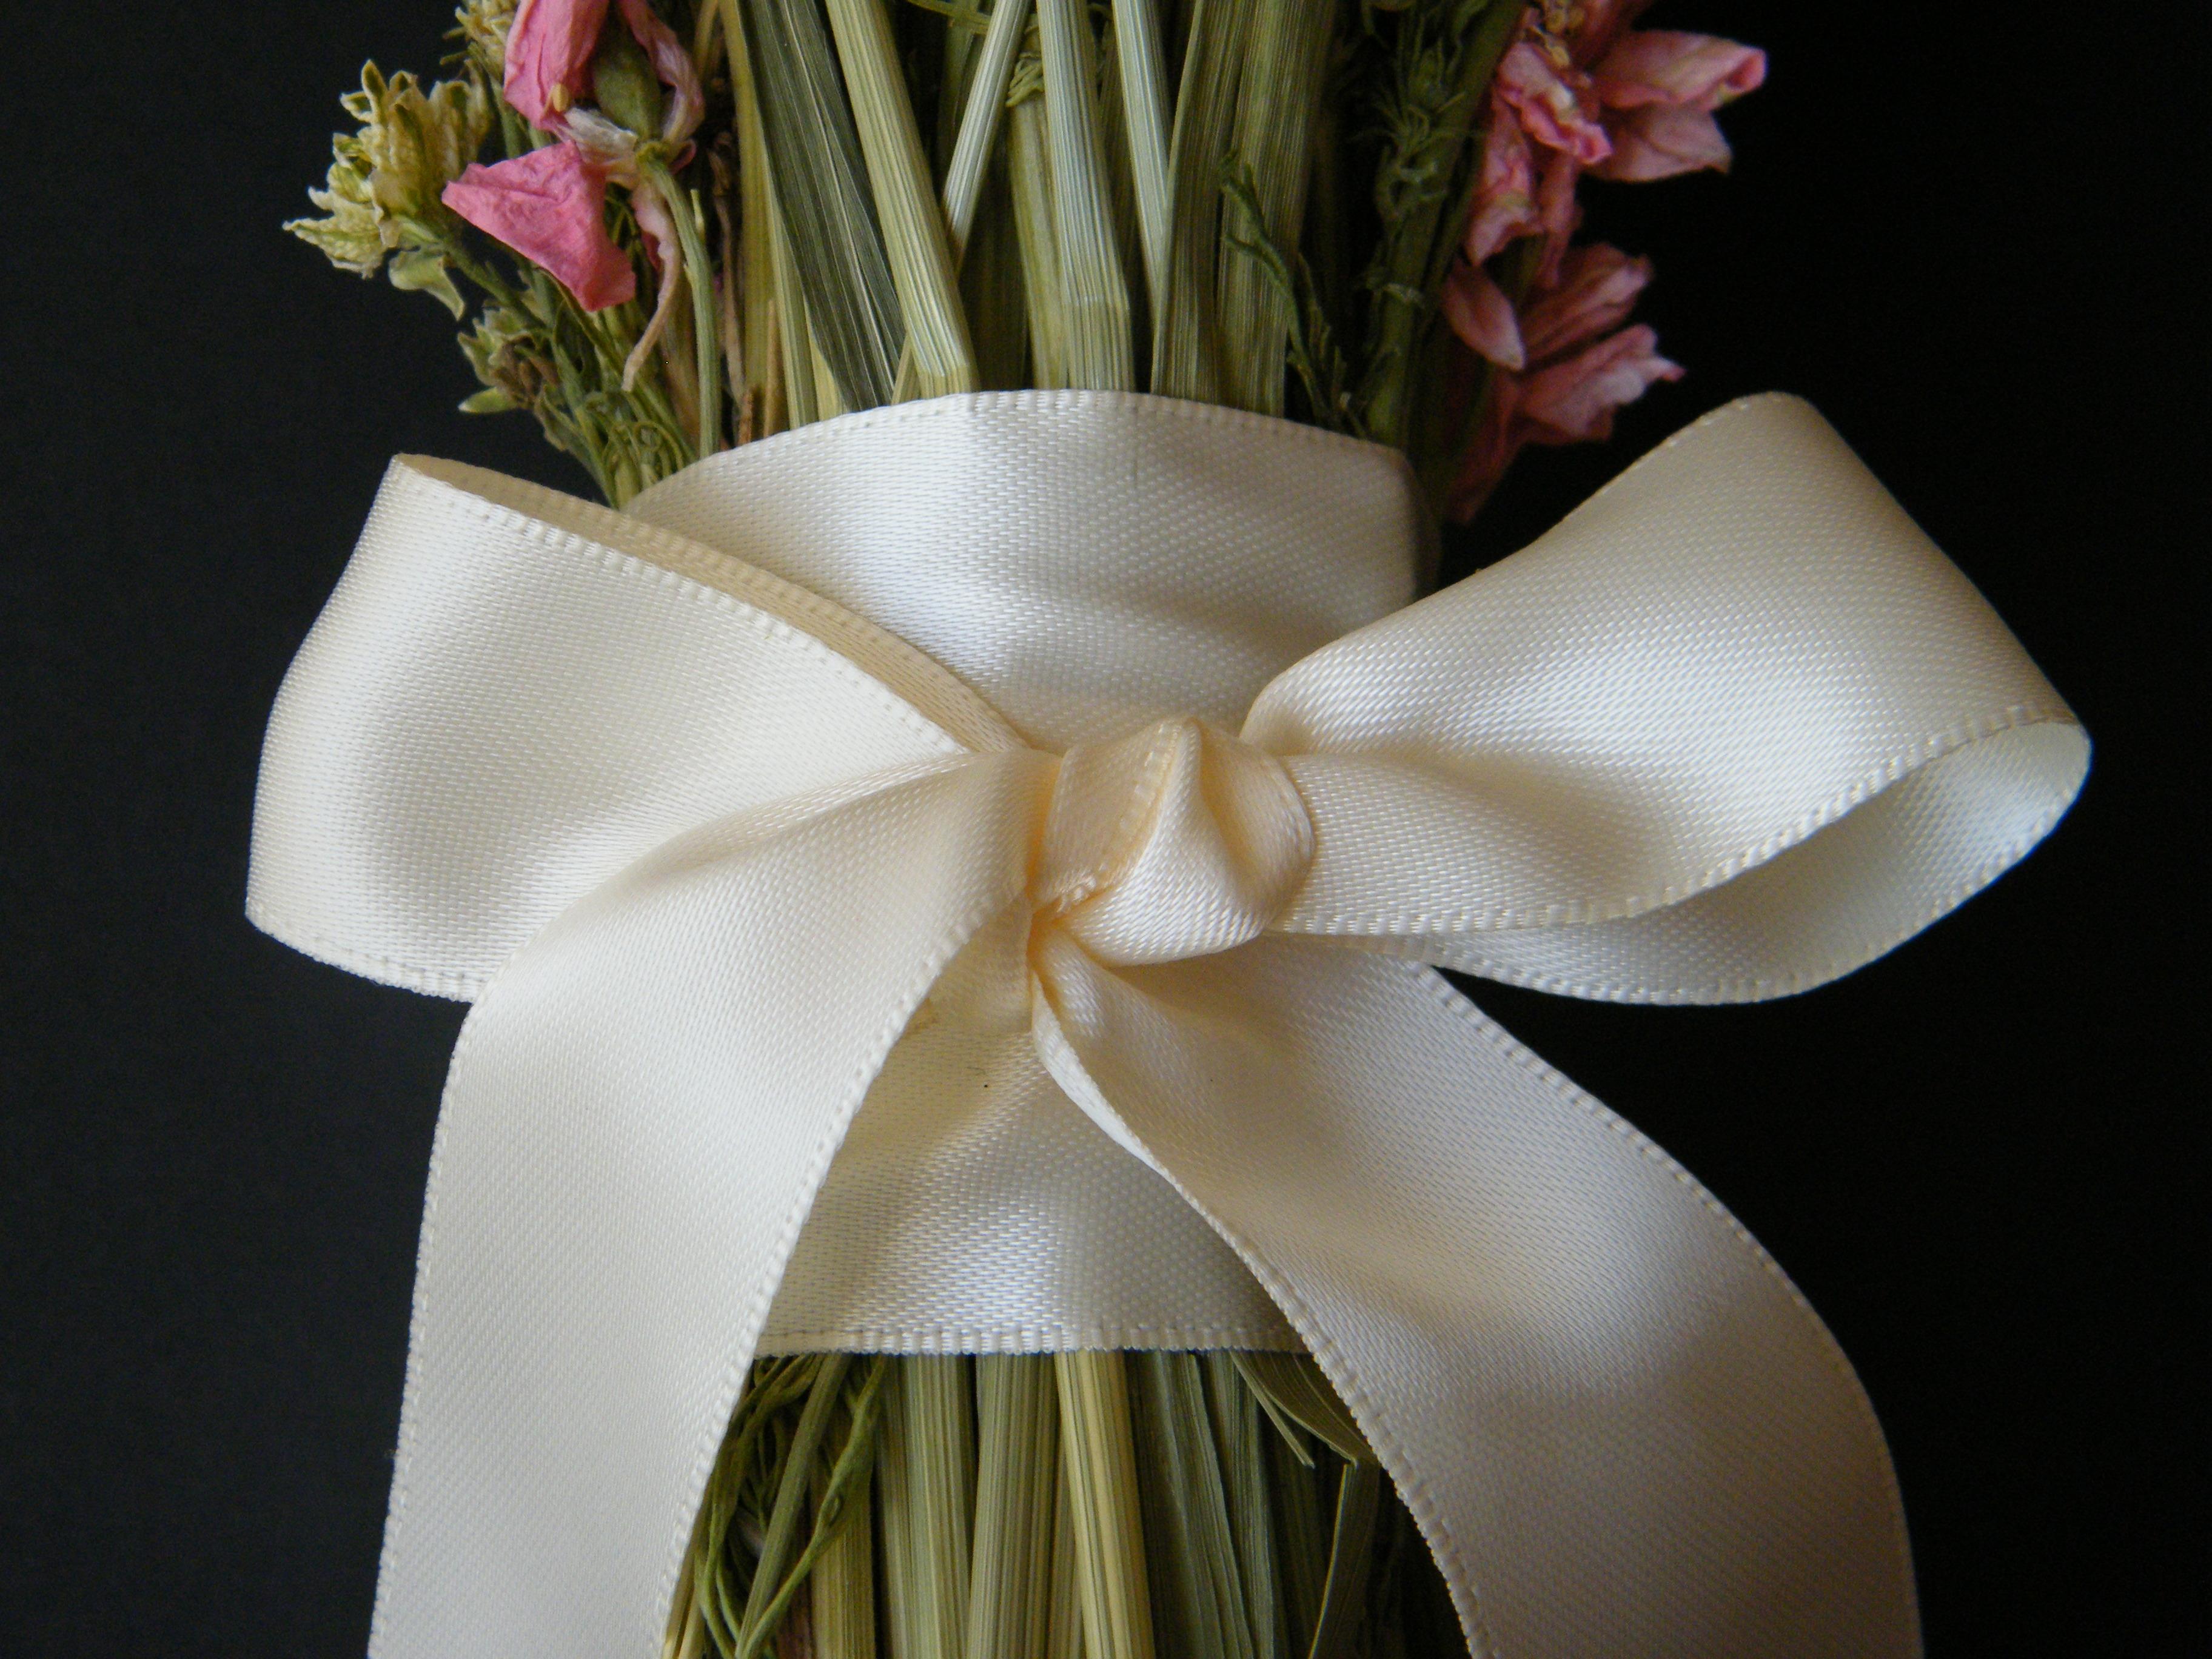 Make A Pink Dried Flower Bouquet Dried Flower Crafts